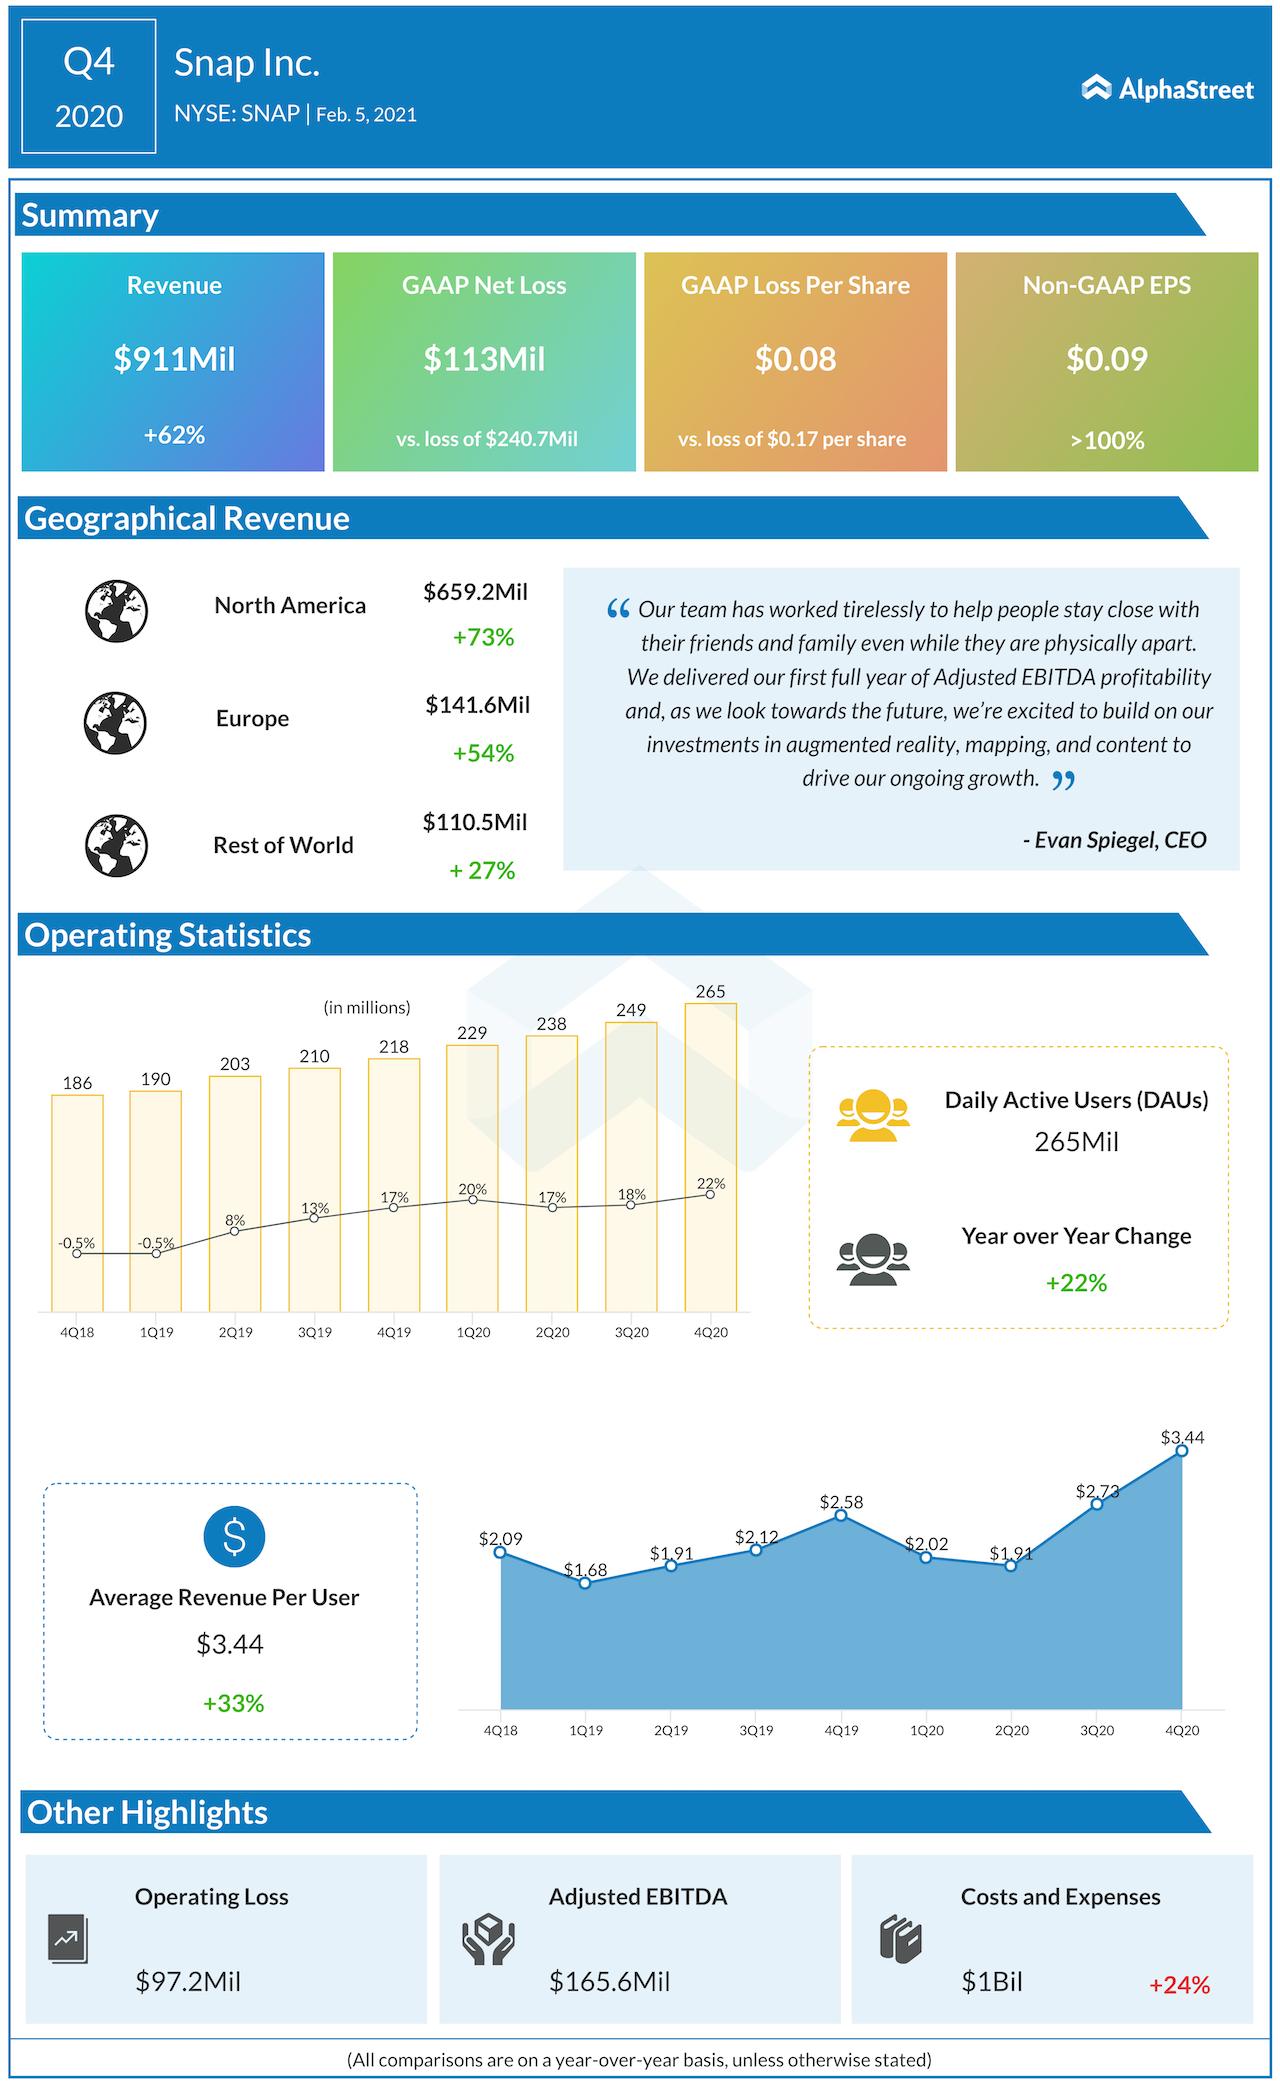 Snap Q4 2020 earnings